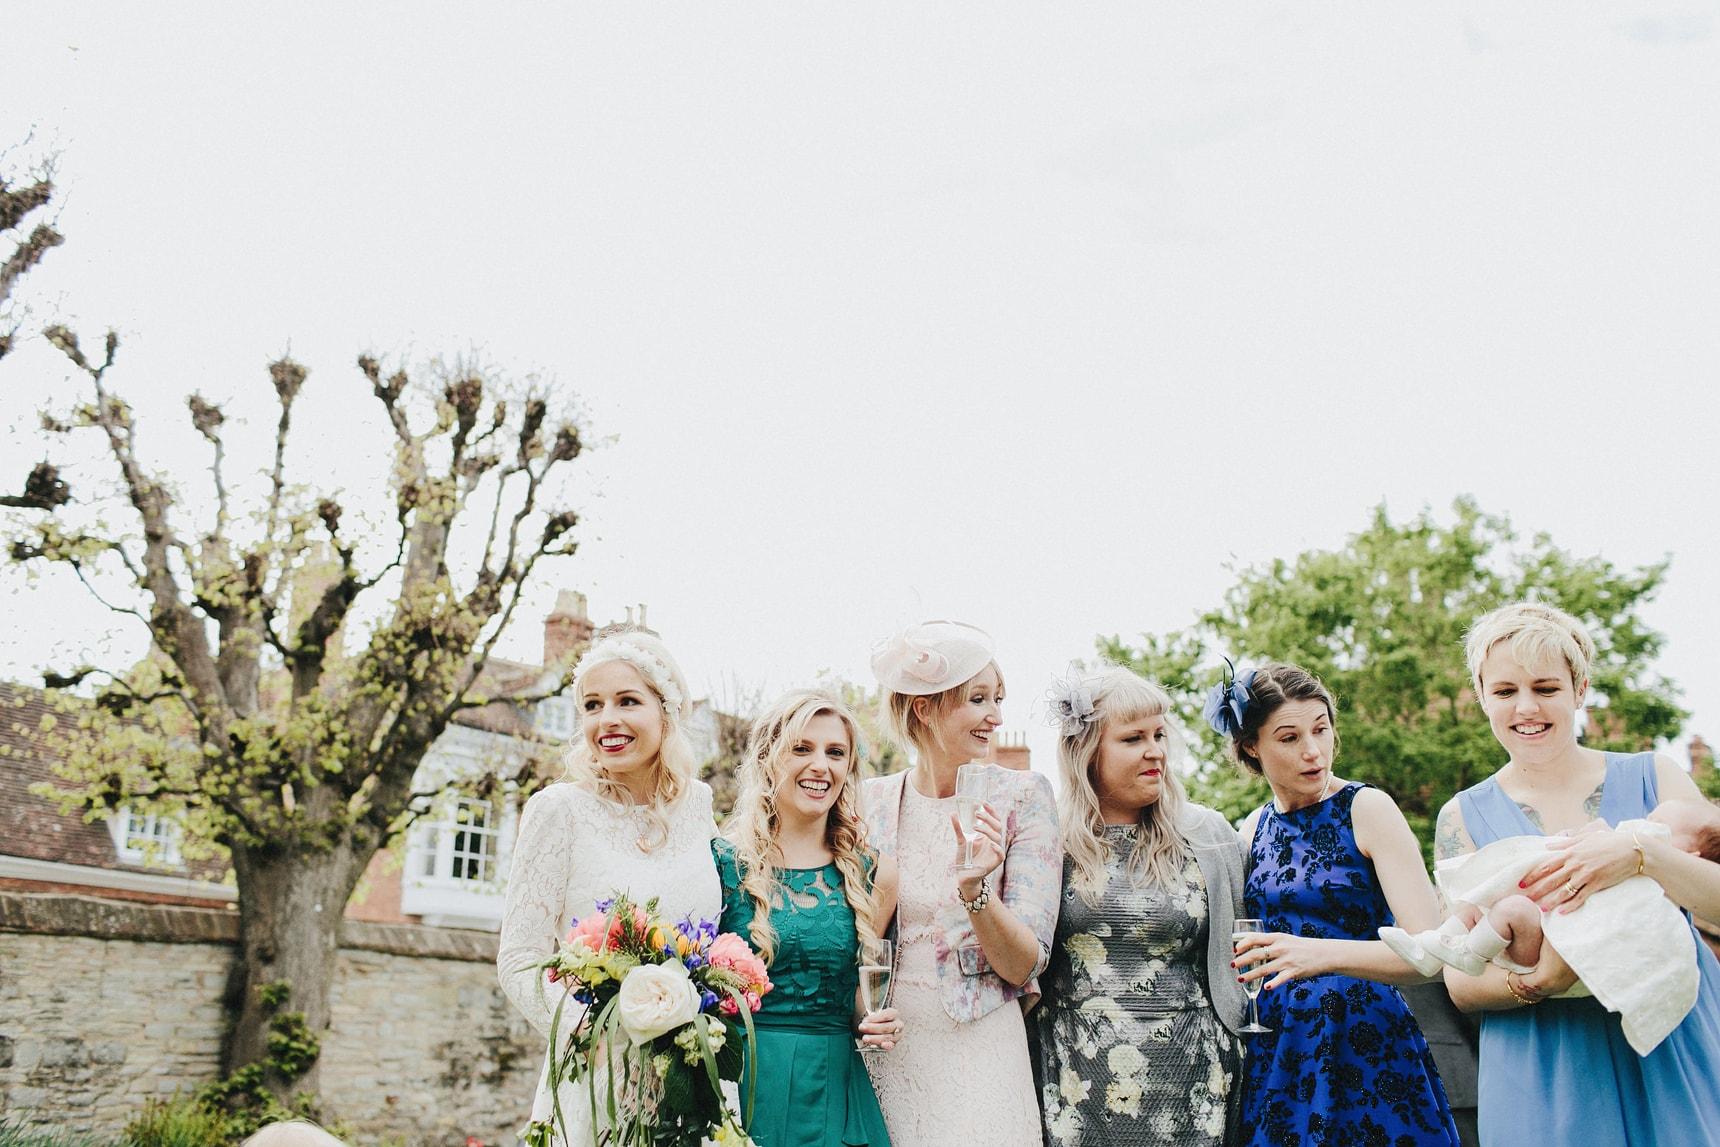 halls croft wedding photography